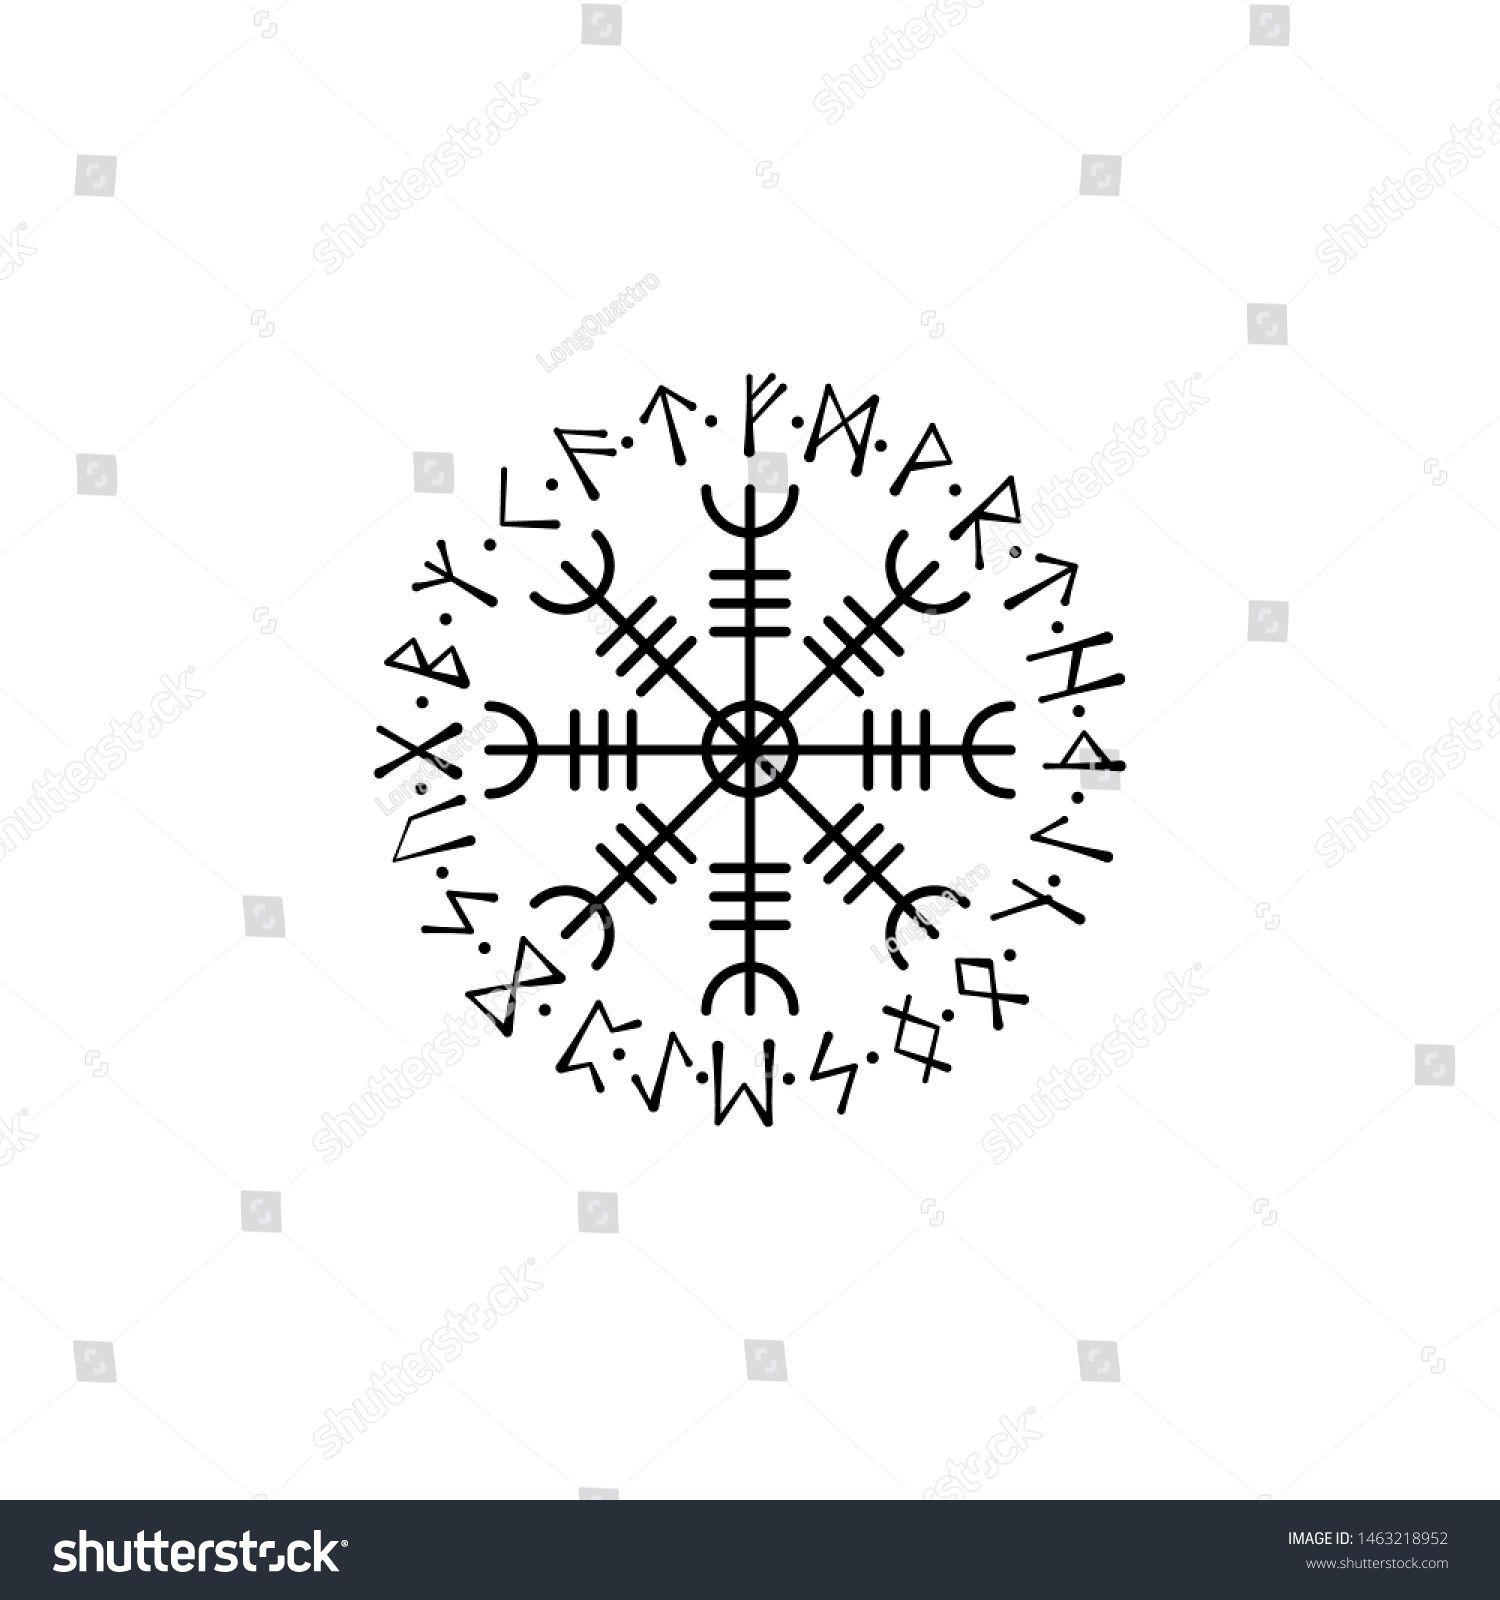 Old Scandinavian Runic Grunge Letters Viking Stock Vector Royalty Free 1463218952 Vikingsymbols Old Scandinavia Viking Symbols Vikings Inspirational Posters